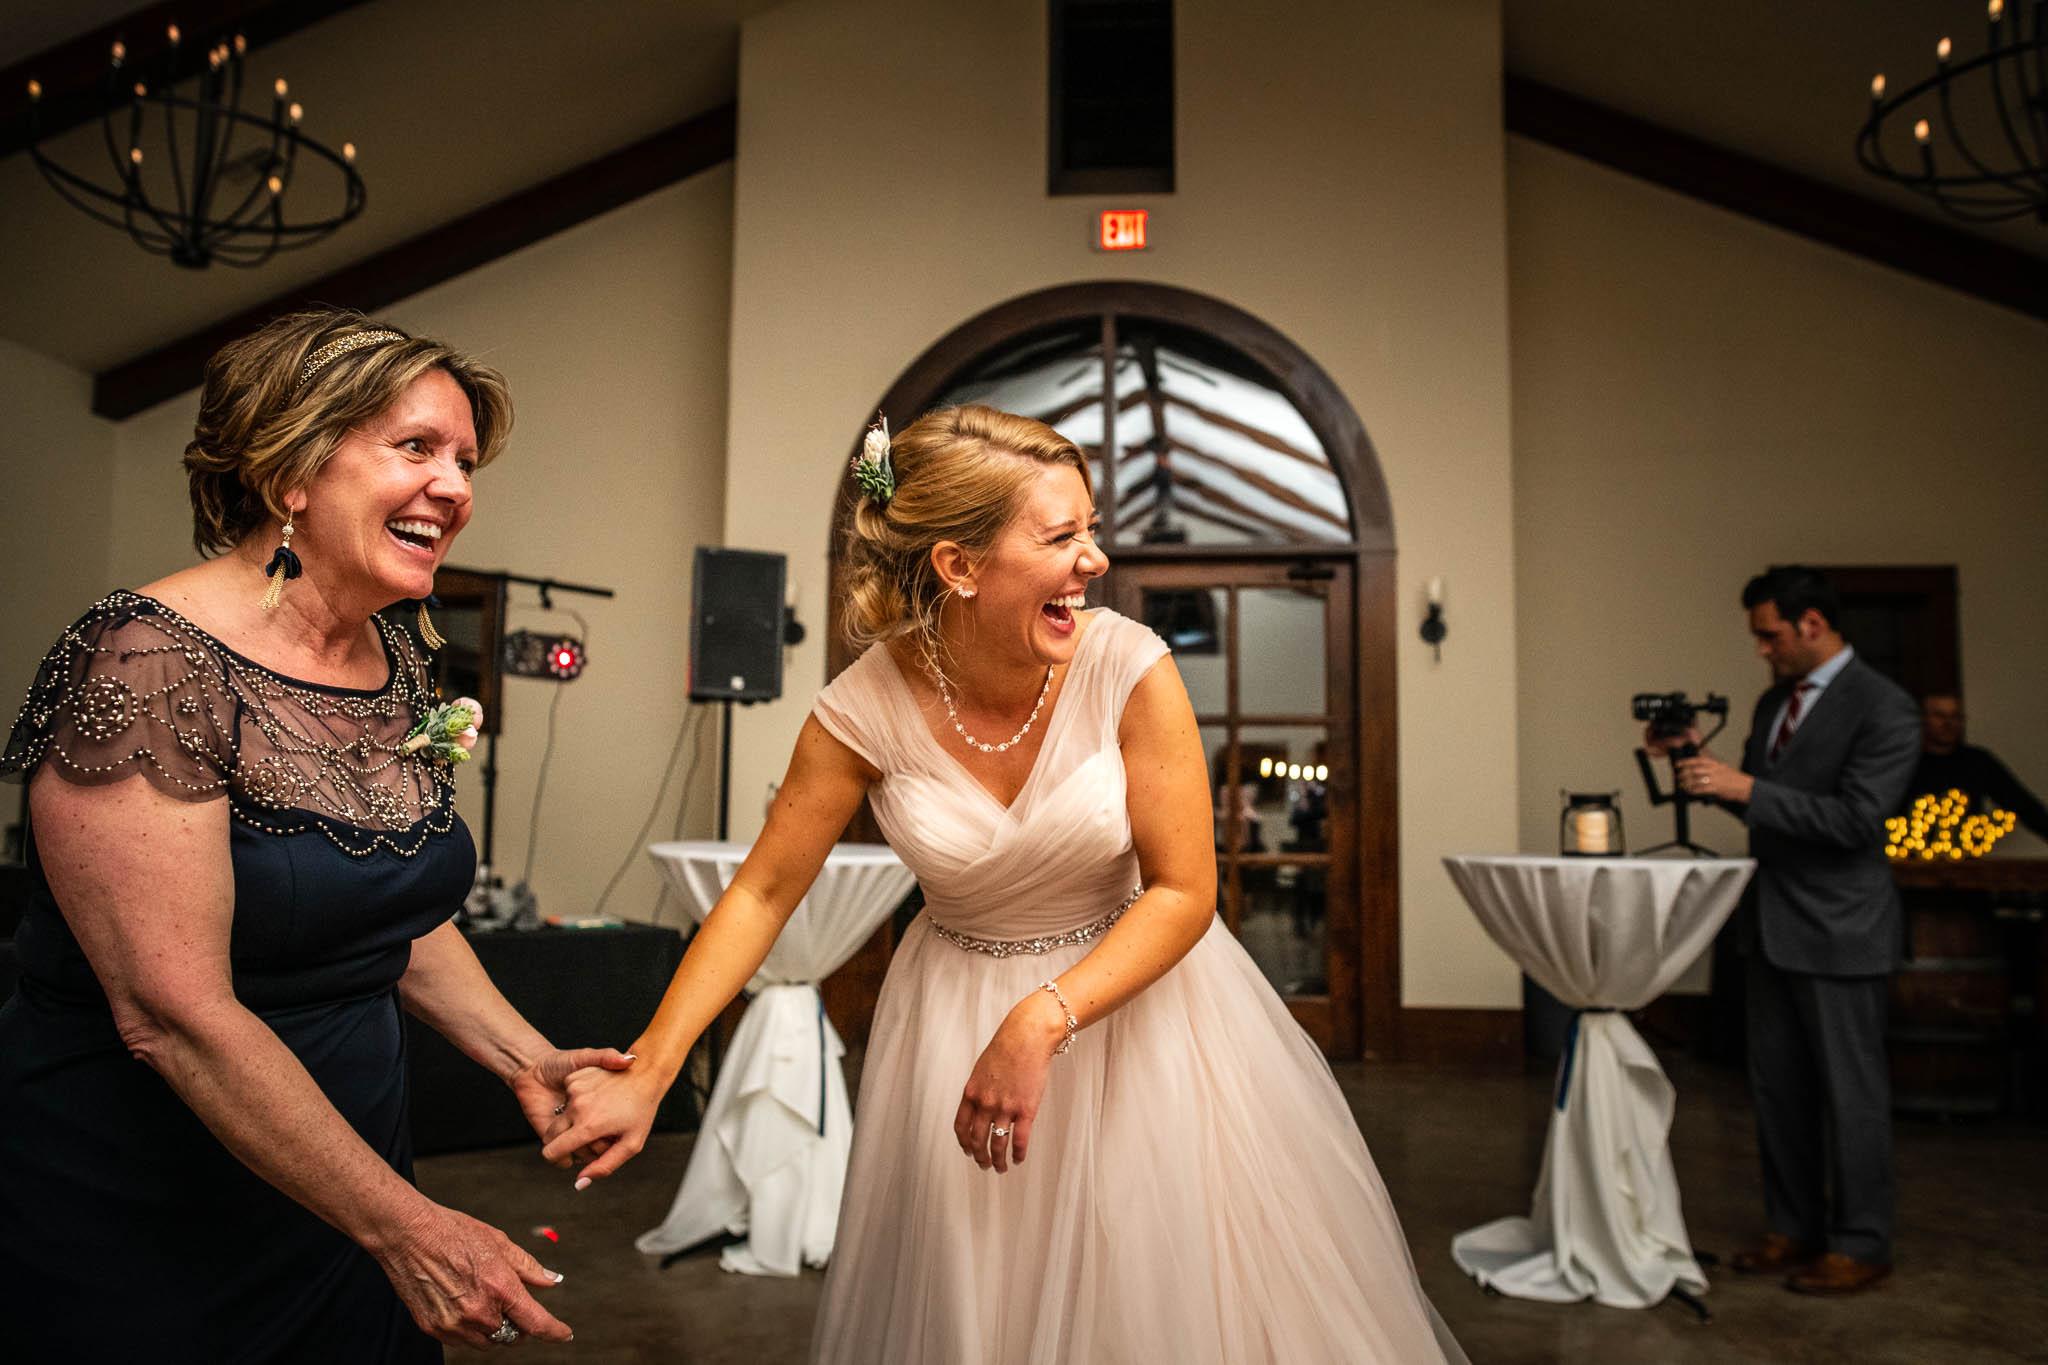 Destination Wedding Photographer Montreal (36 of 39).jpg